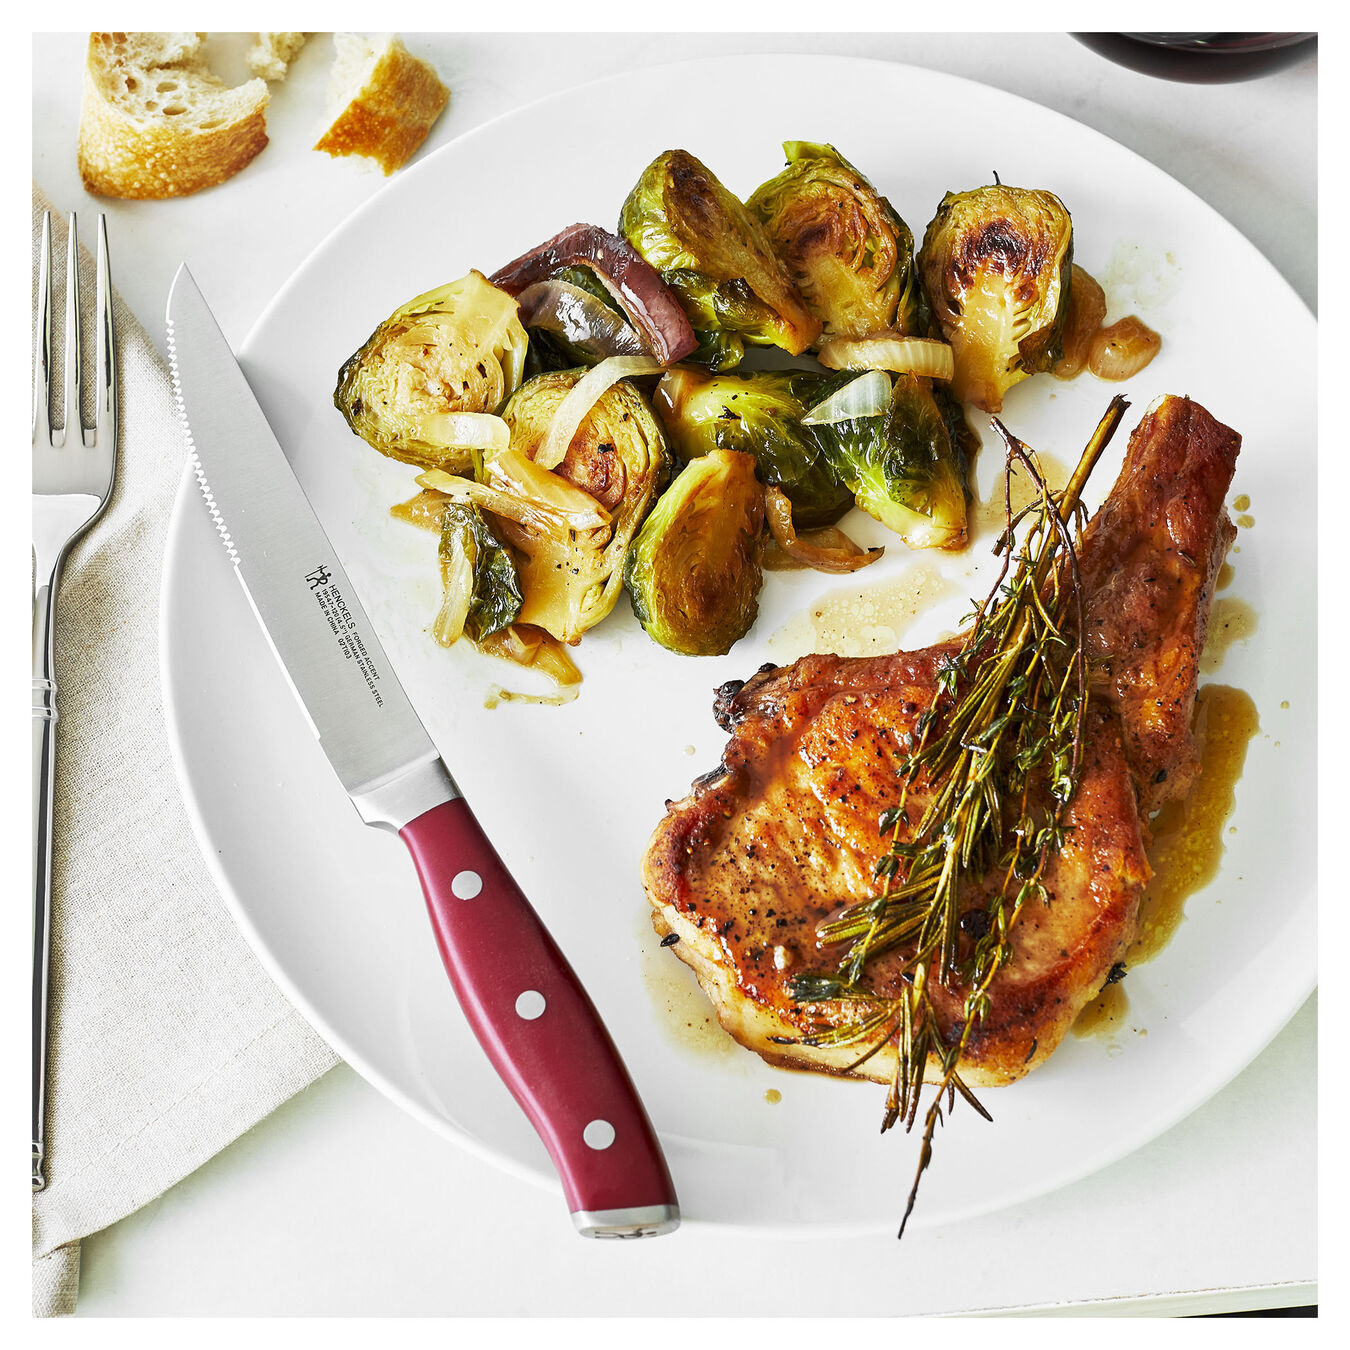 4-pc, Steak Knife Set - Red,,large 3